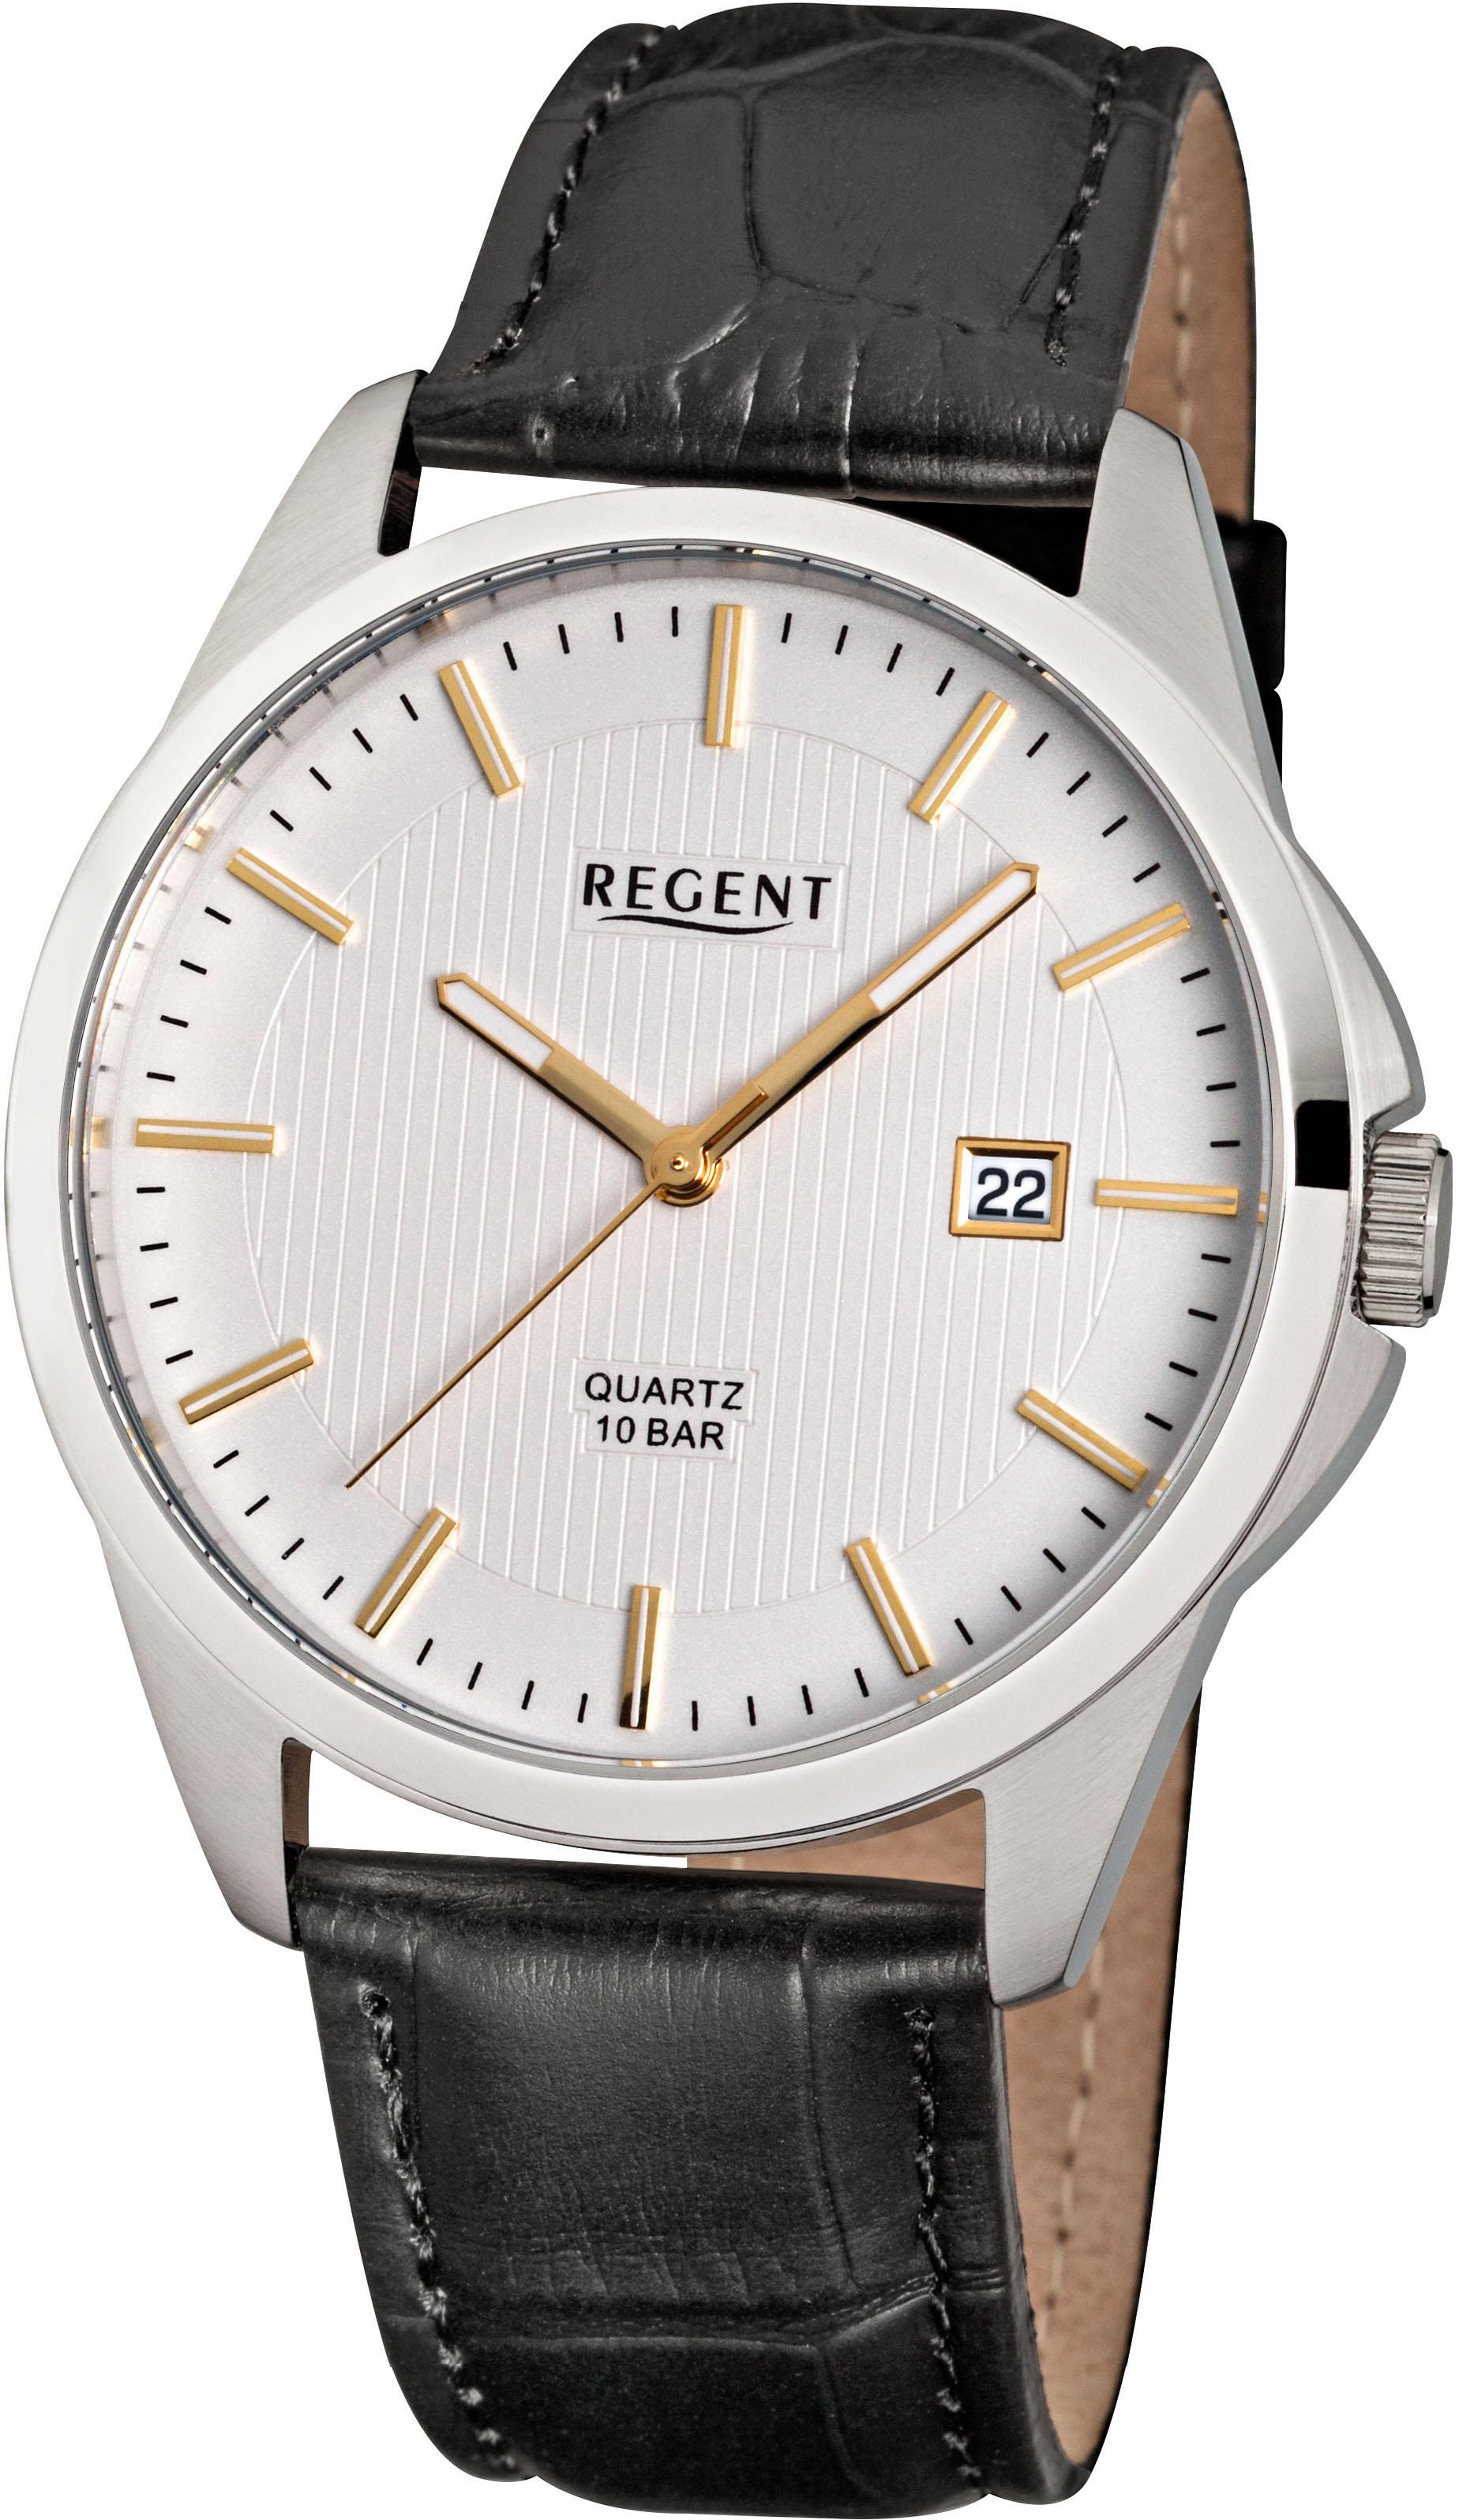 Regent Quarzuhr 17654011 F915   Uhren > Quarzuhren   Schwarz   Regent